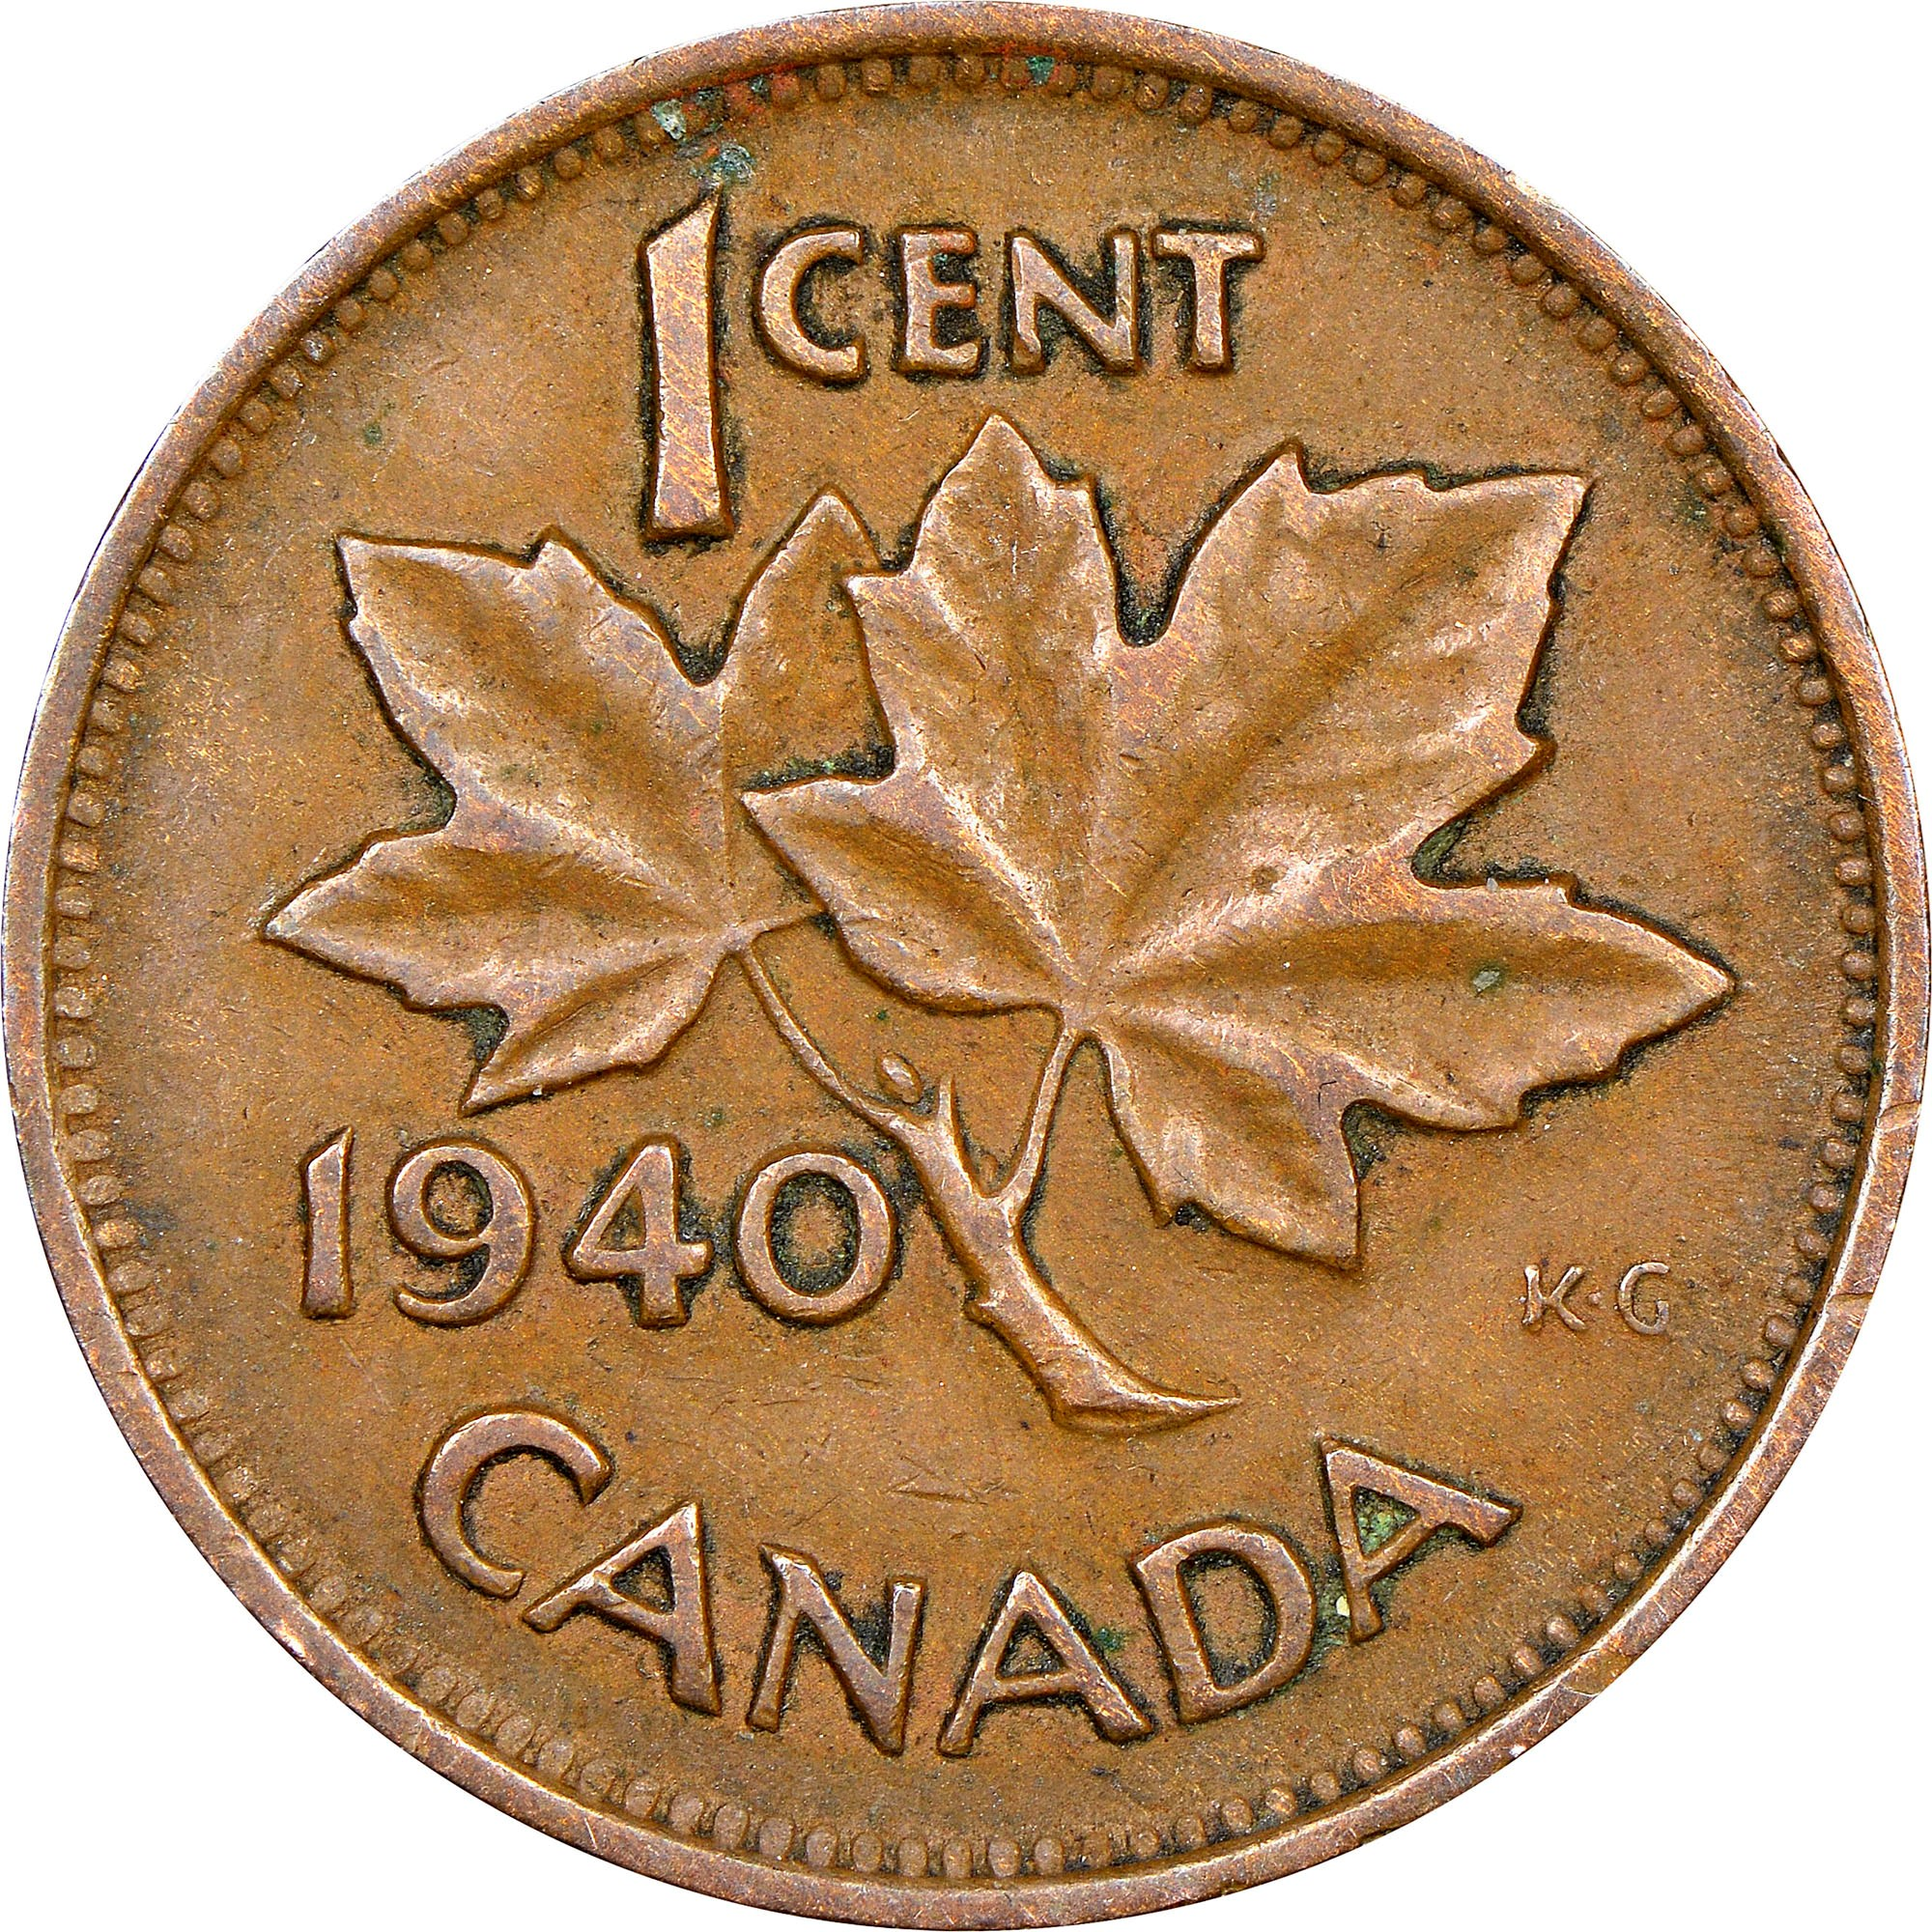 Canada Cent reverse